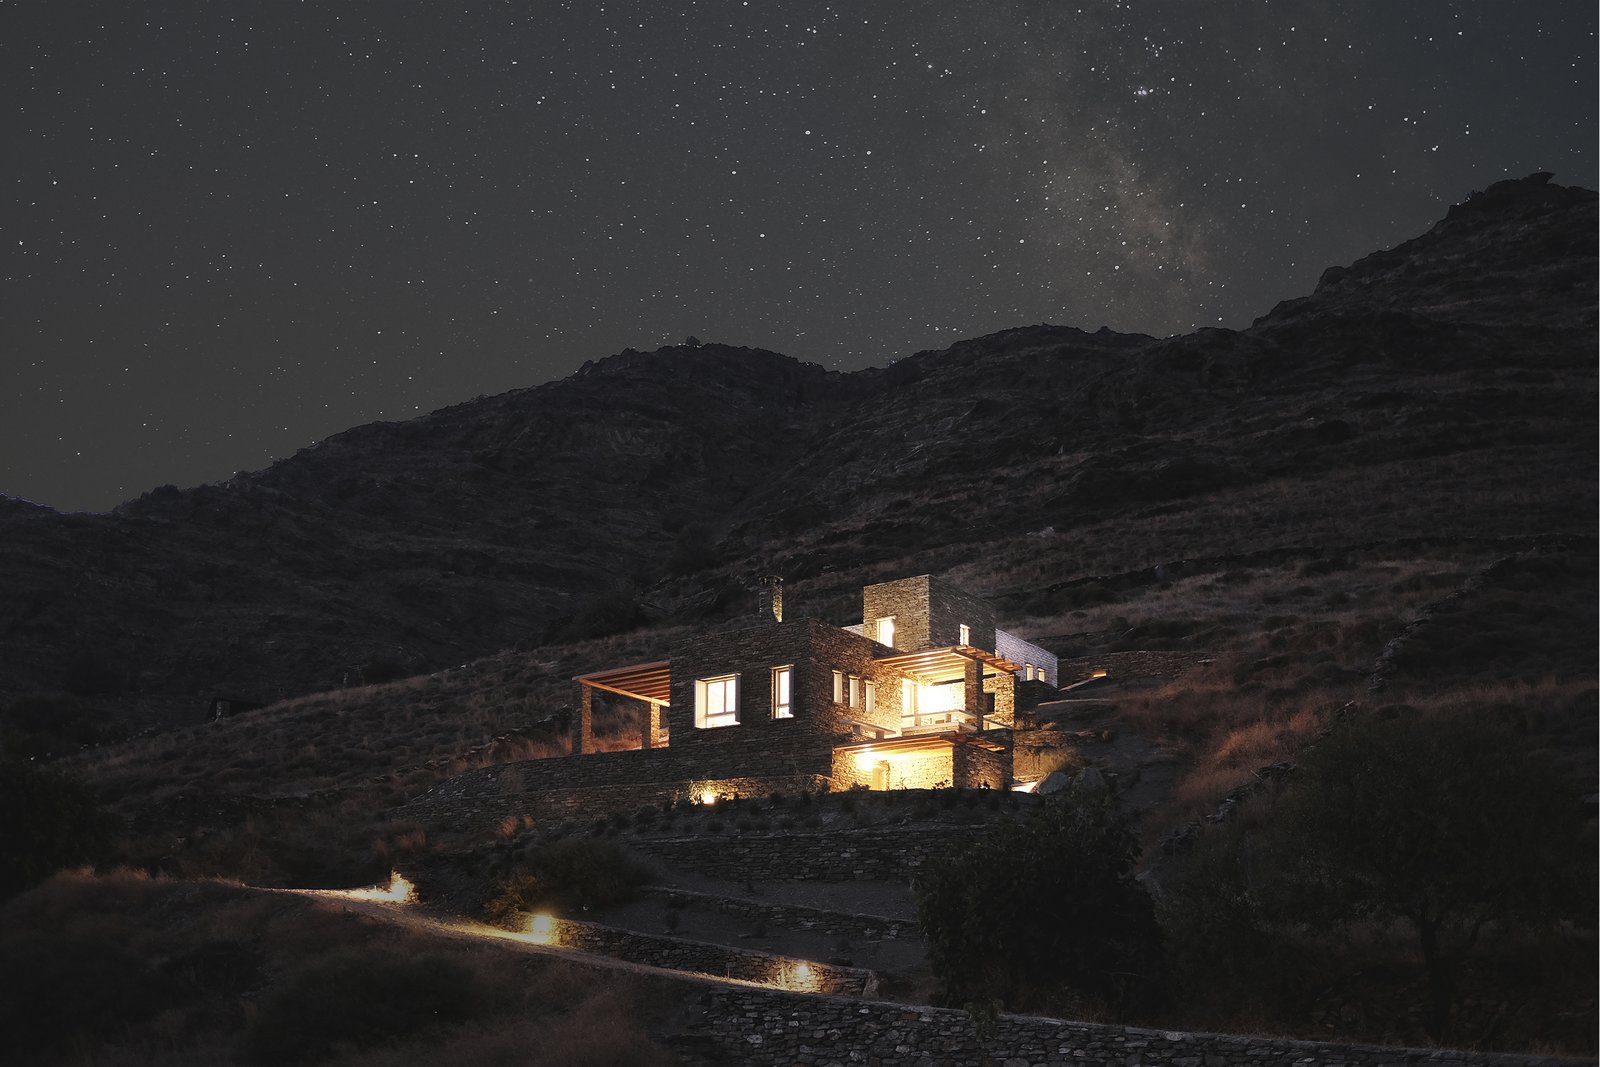 Summer night in a mediterranean island  ROCKSPLIT house by COMETA ARCHITECTS